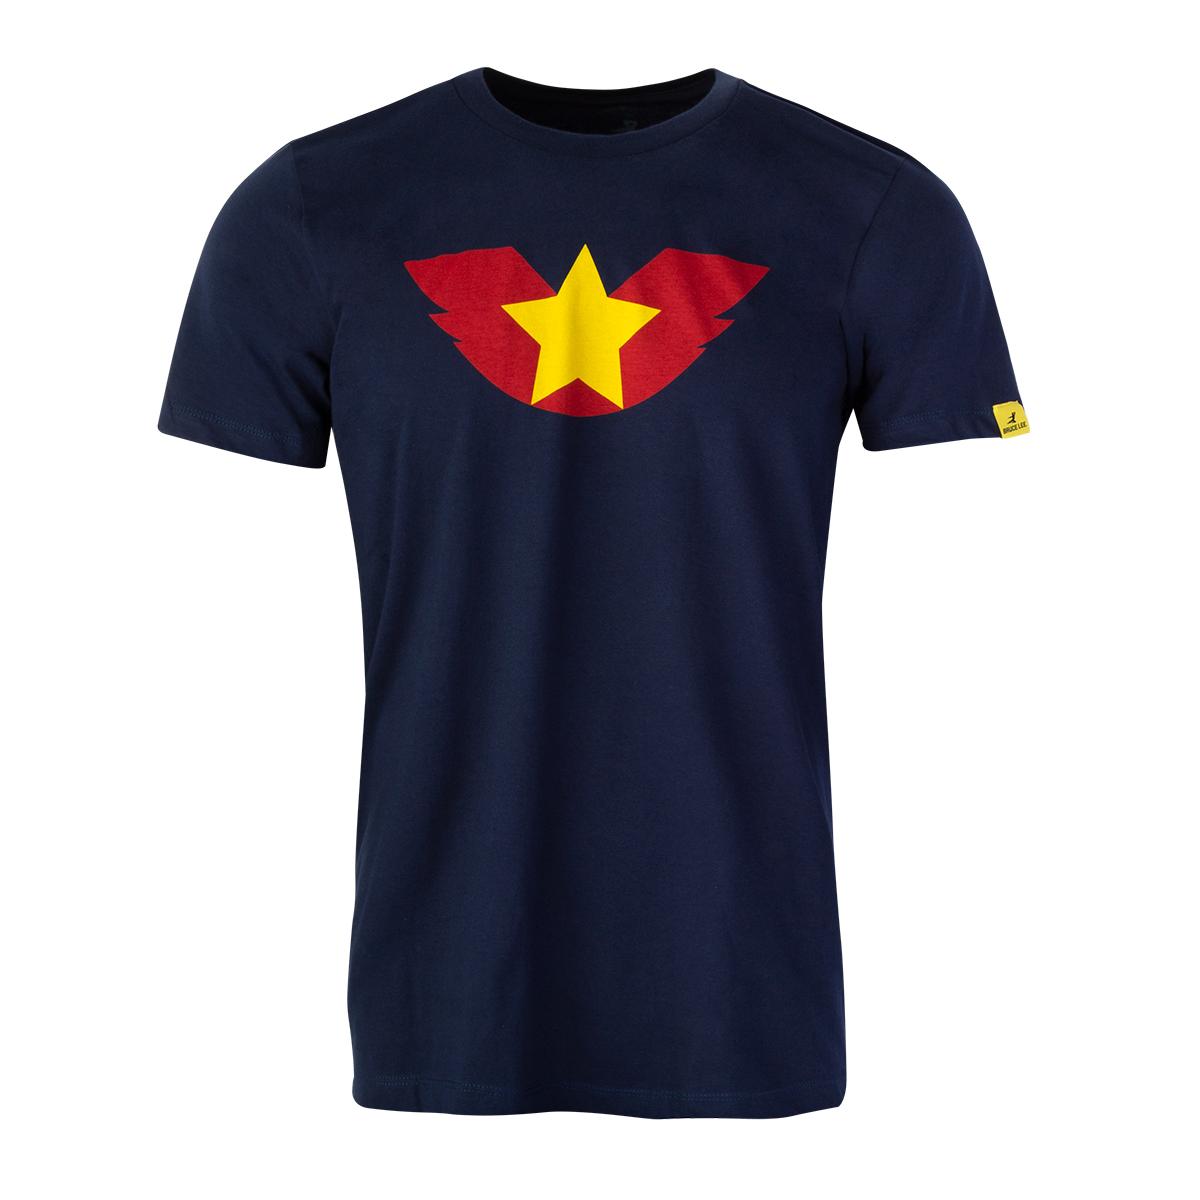 Wing Star T-shirt